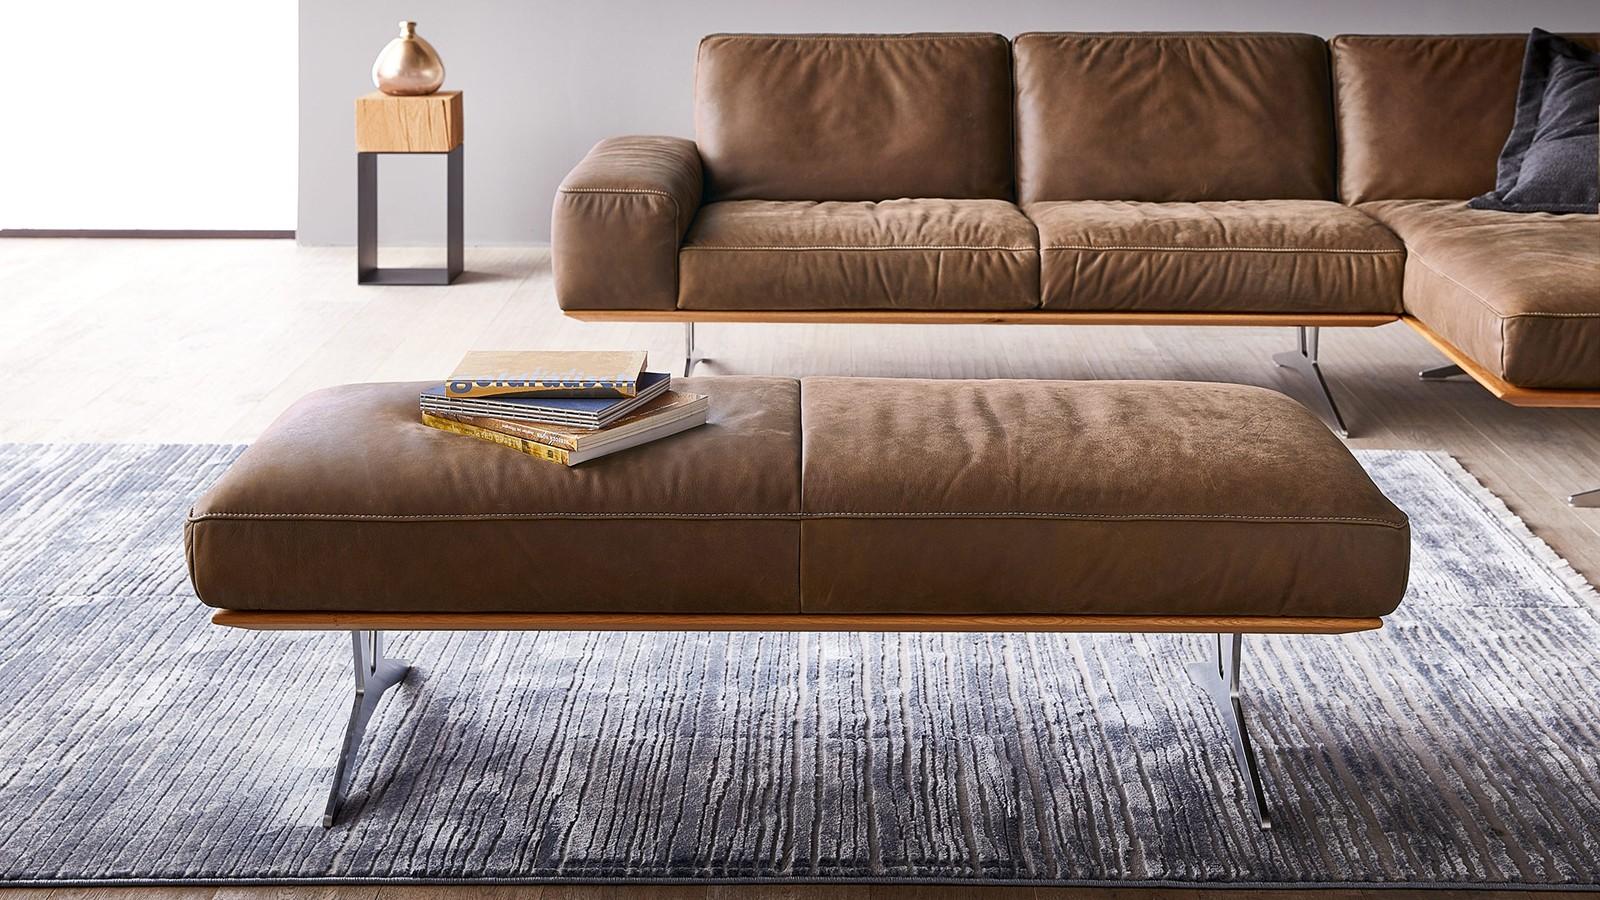 Canapea modernă Koinor Hiero